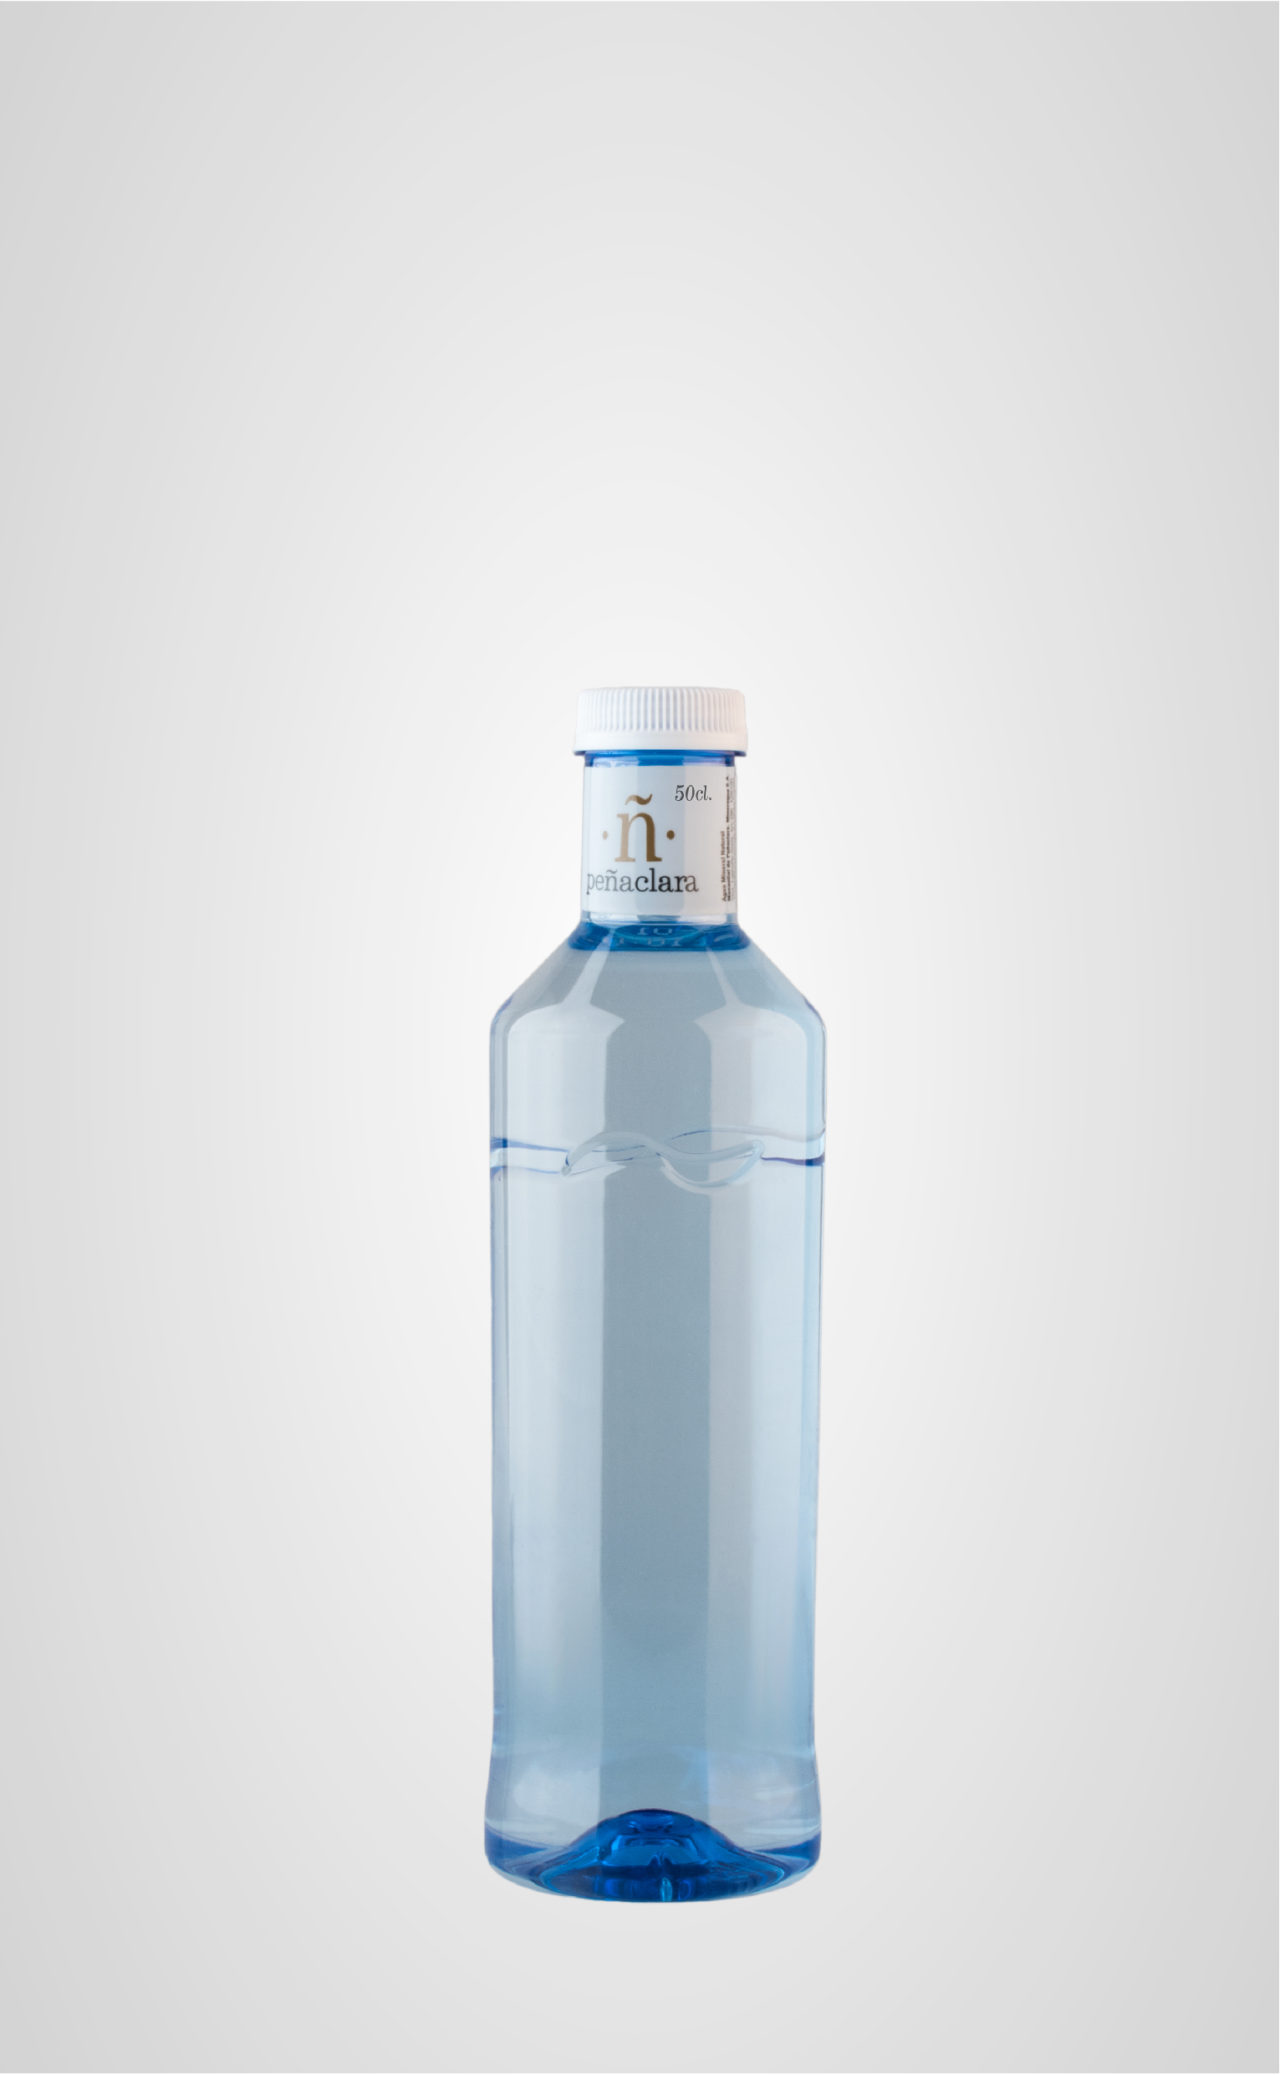 Botella Ñ 50cl Peñaclara